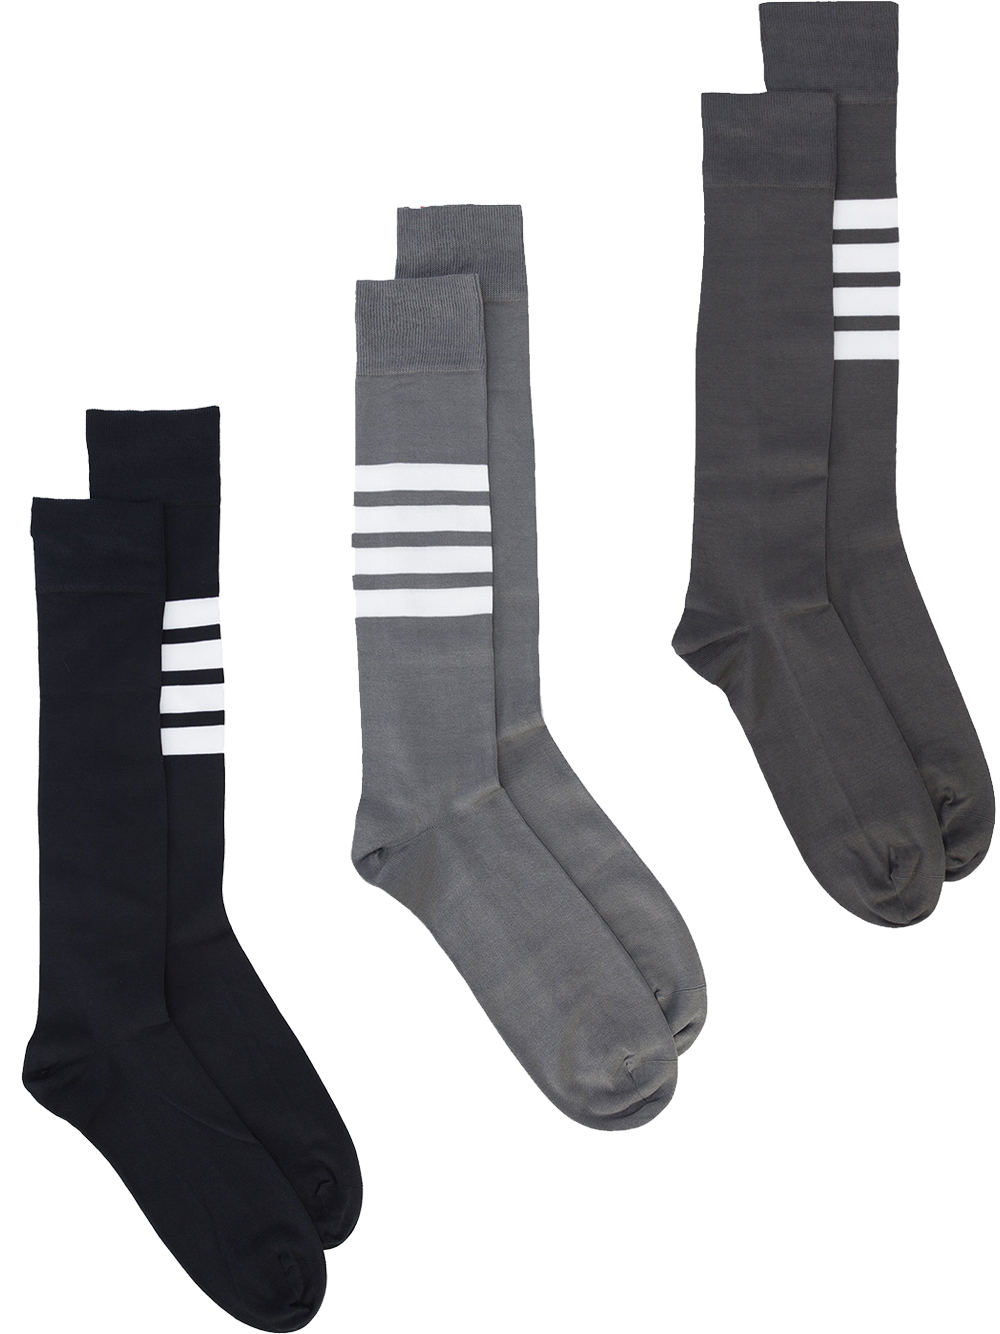 Thom Browne   Engineered Four Bar Stripe Socks